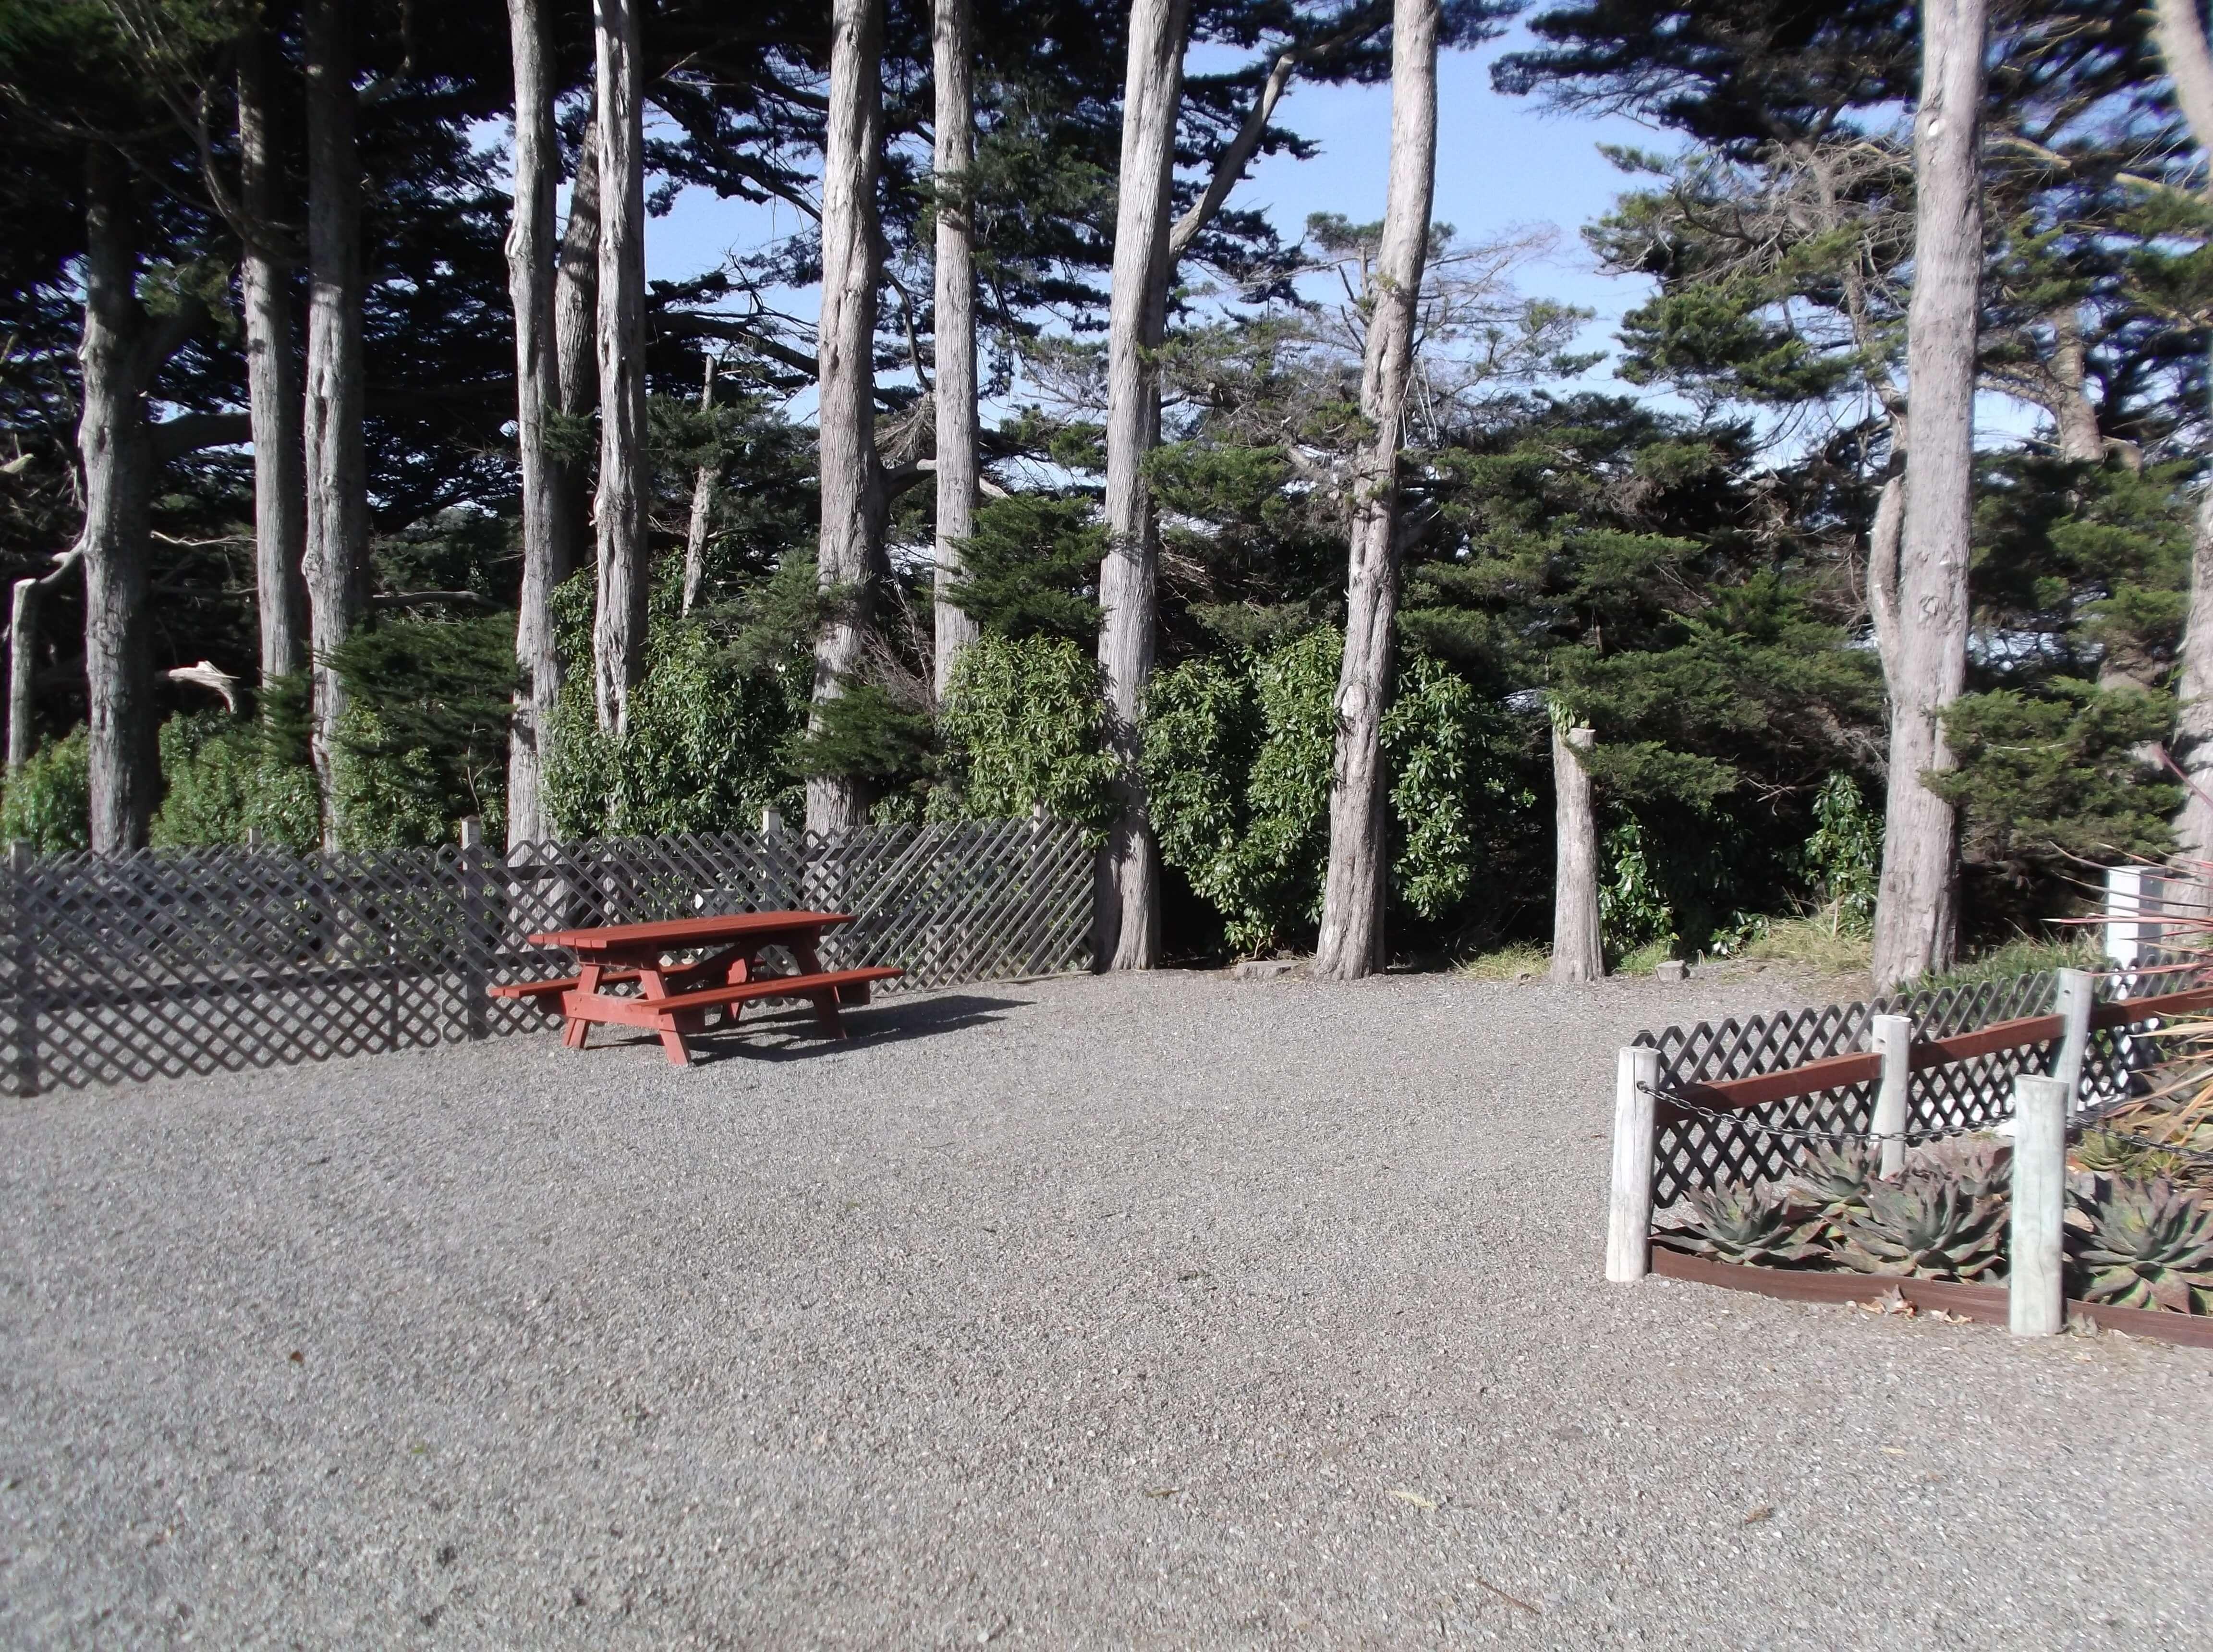 Bodega bay camping with full hookups